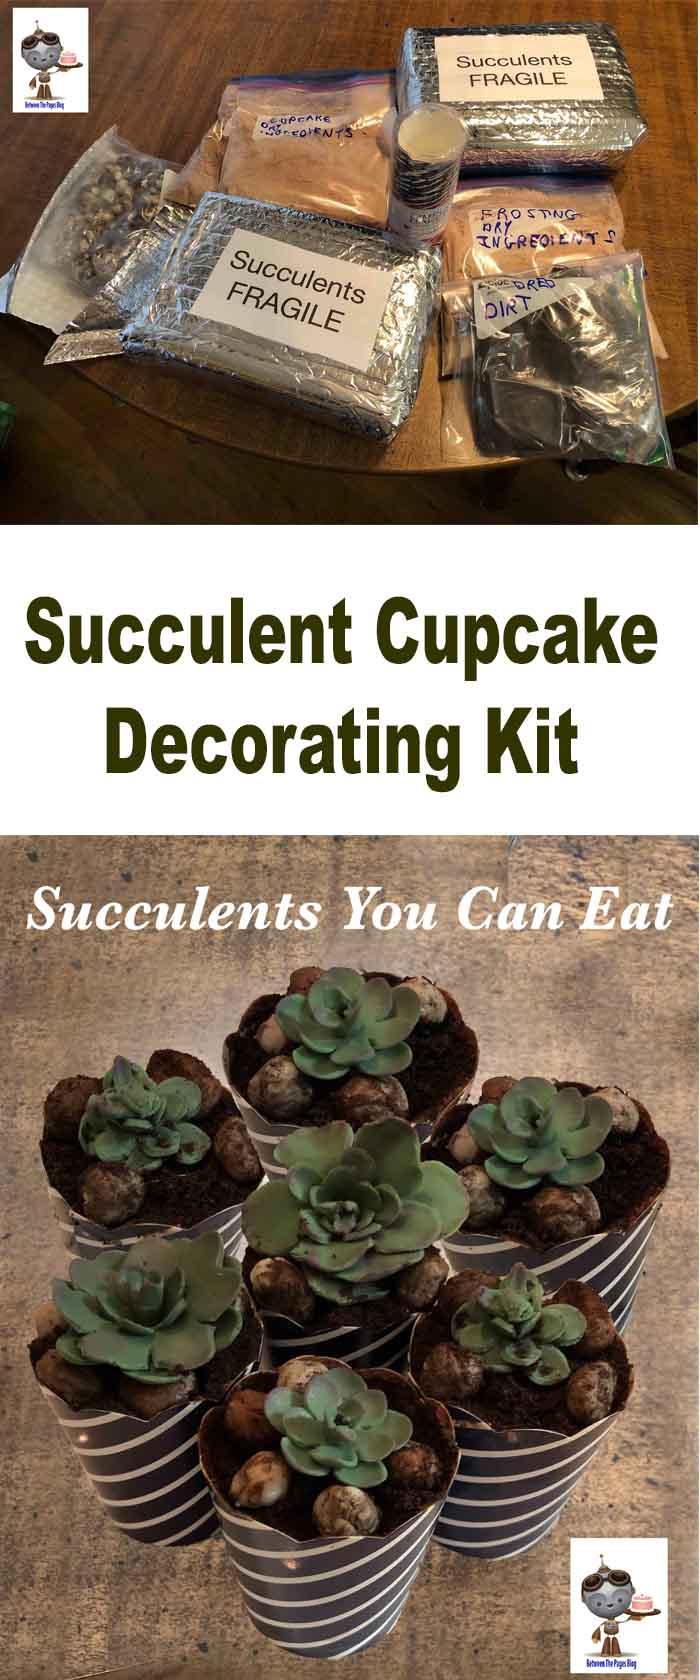 Succulent Cupcake Kit